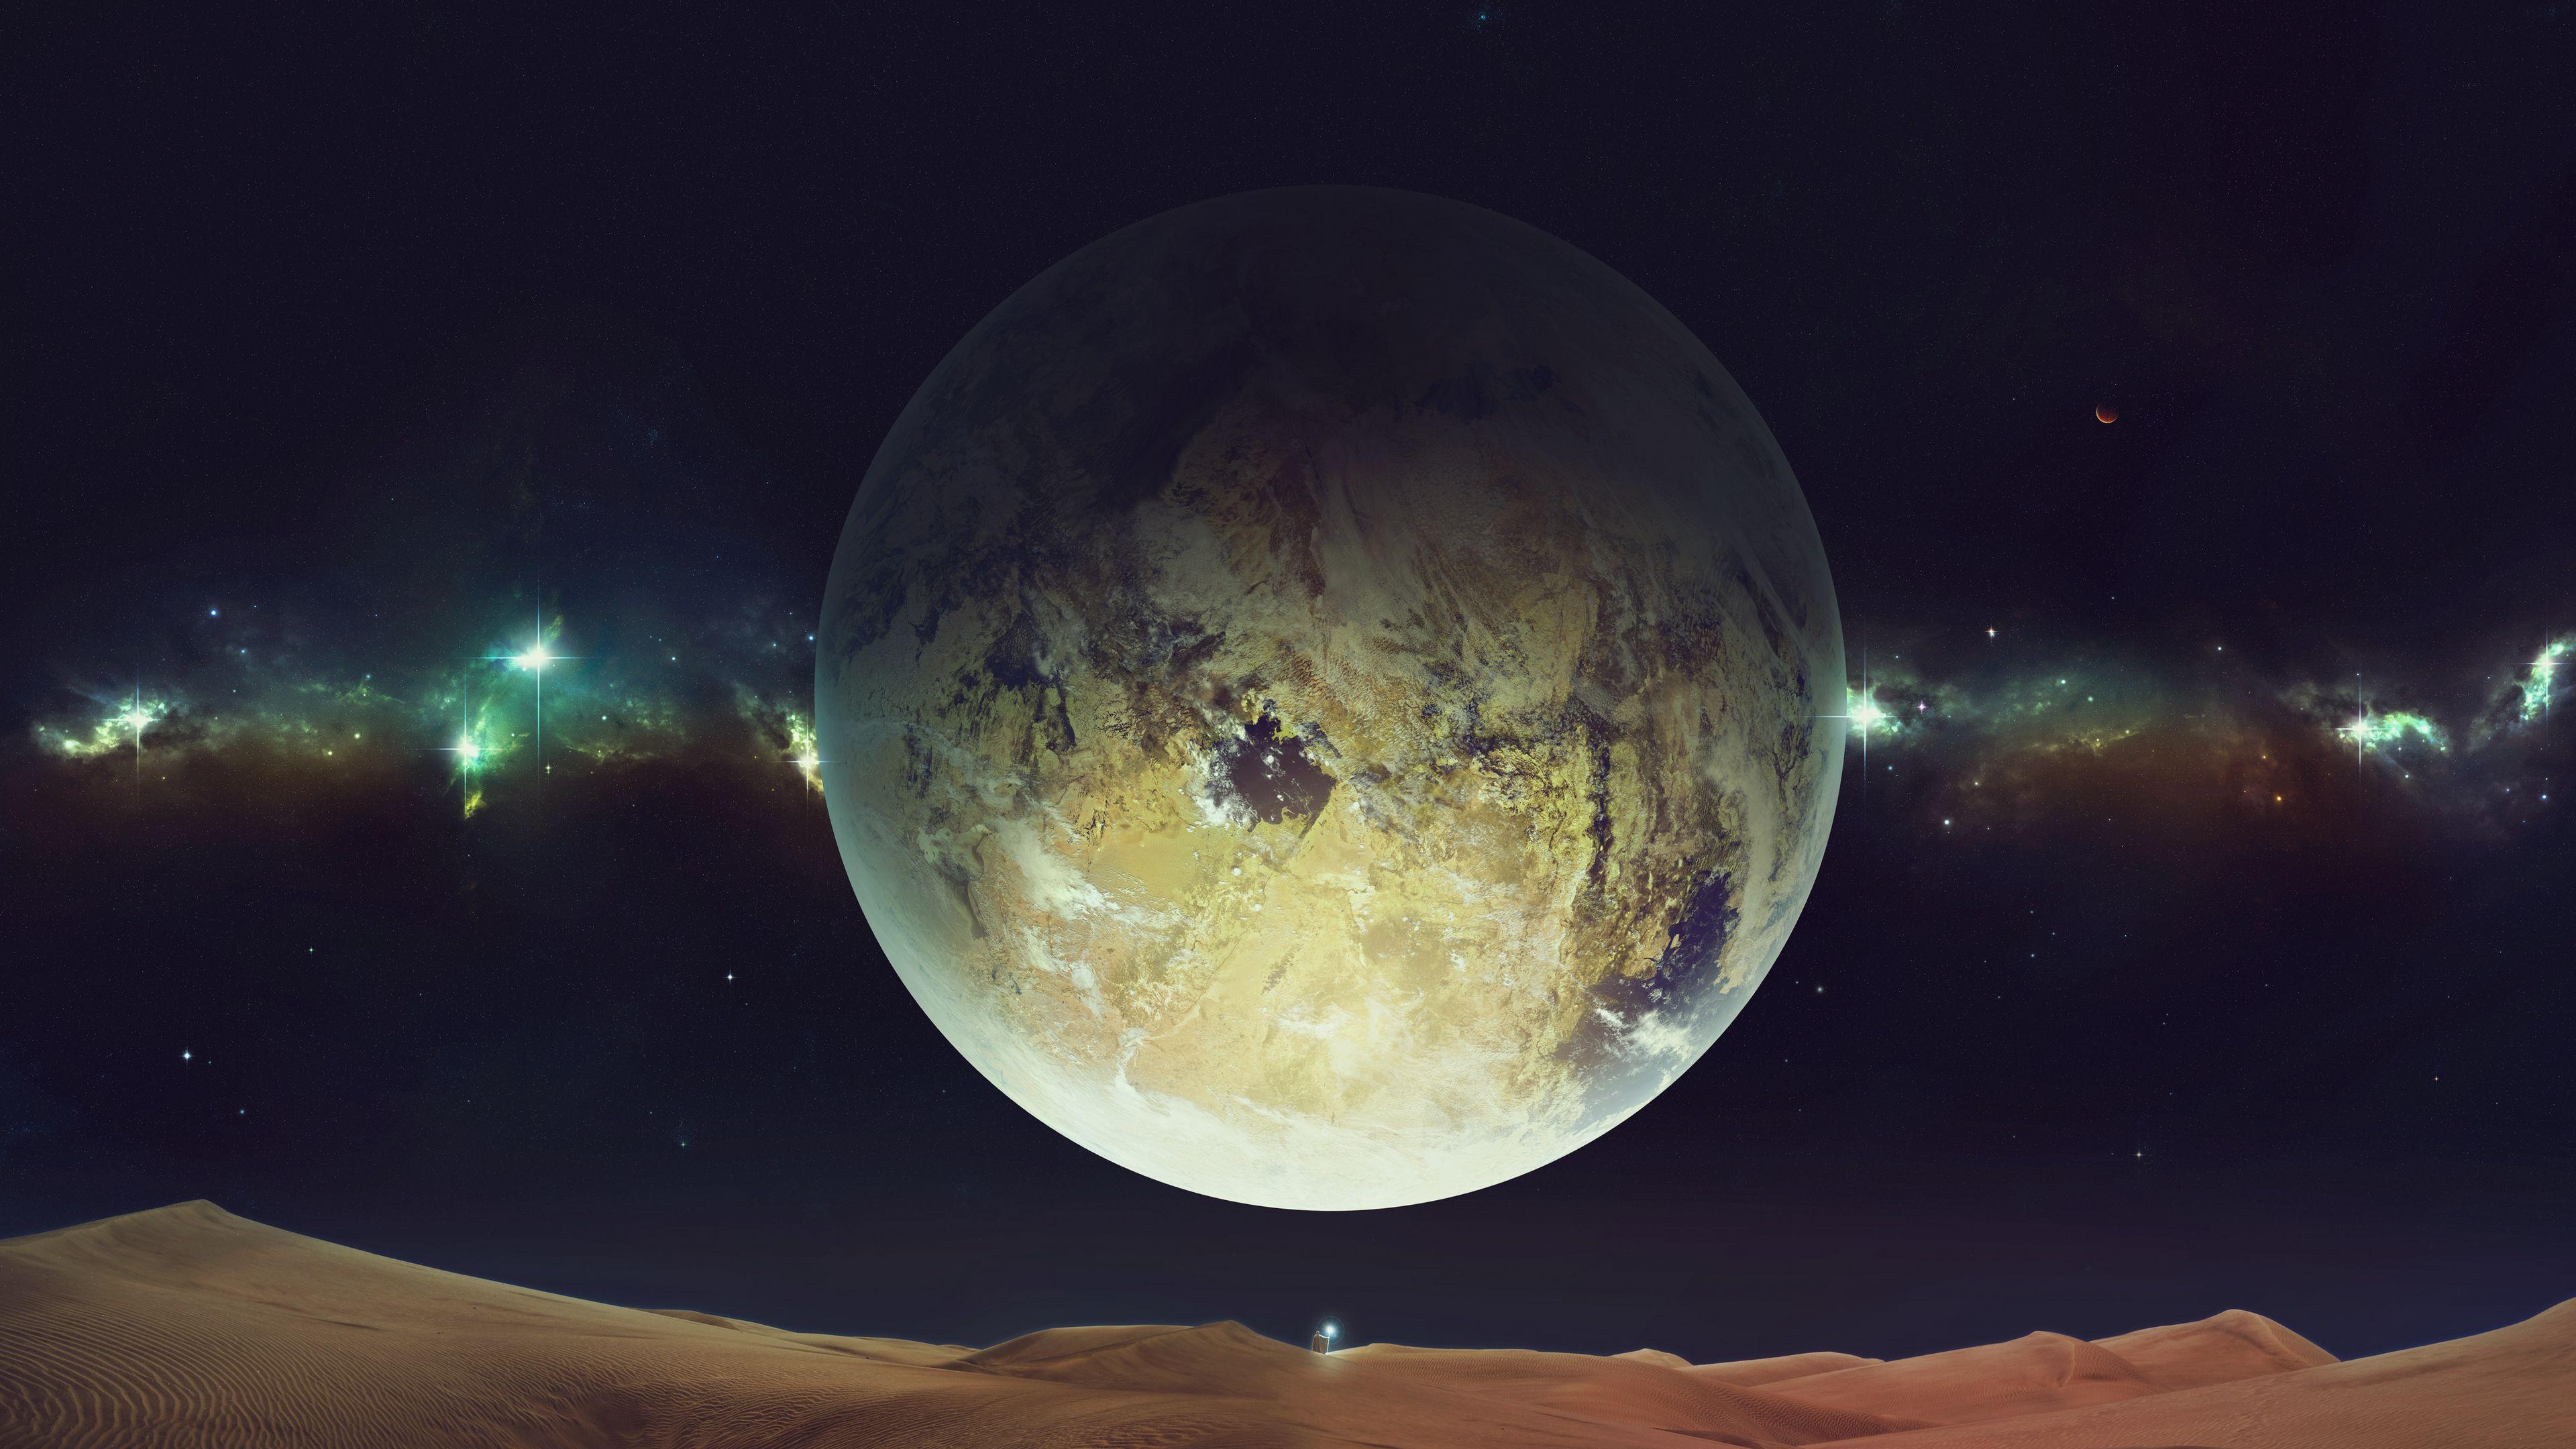 3840x2160 Wallpaper space, planet, sky